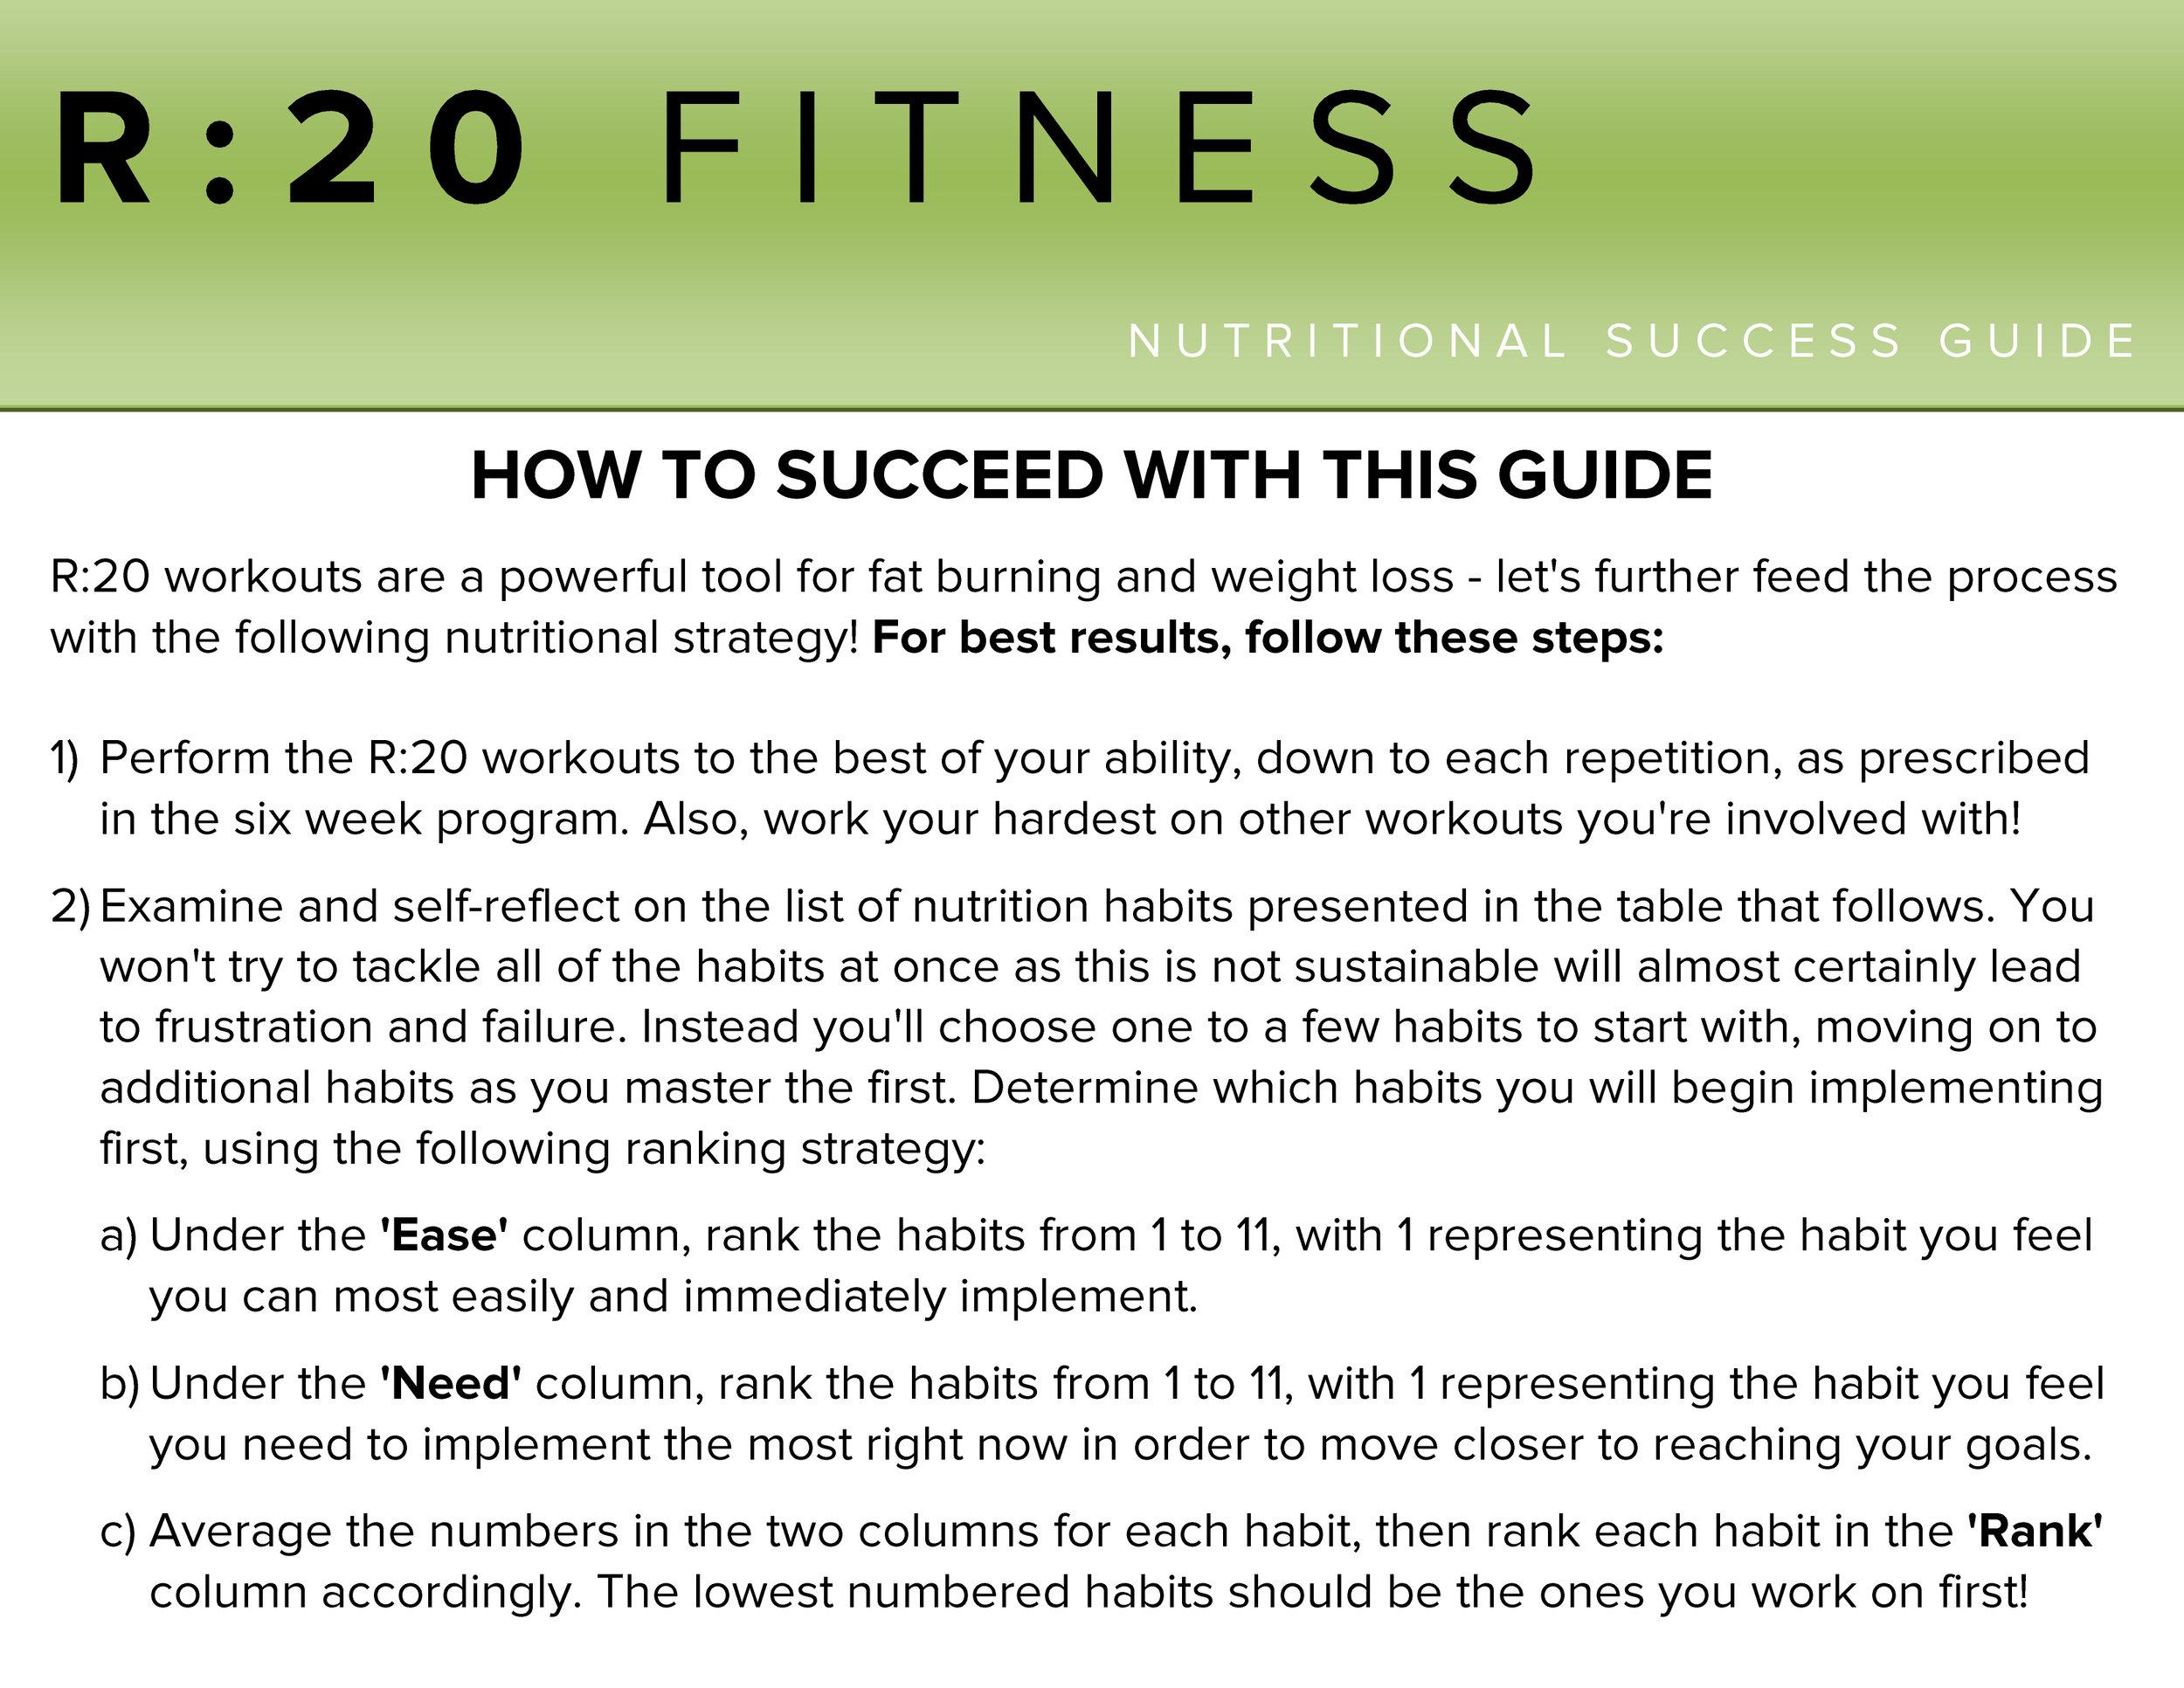 R20 1.0 Nutritional Success Guide-5.jpg